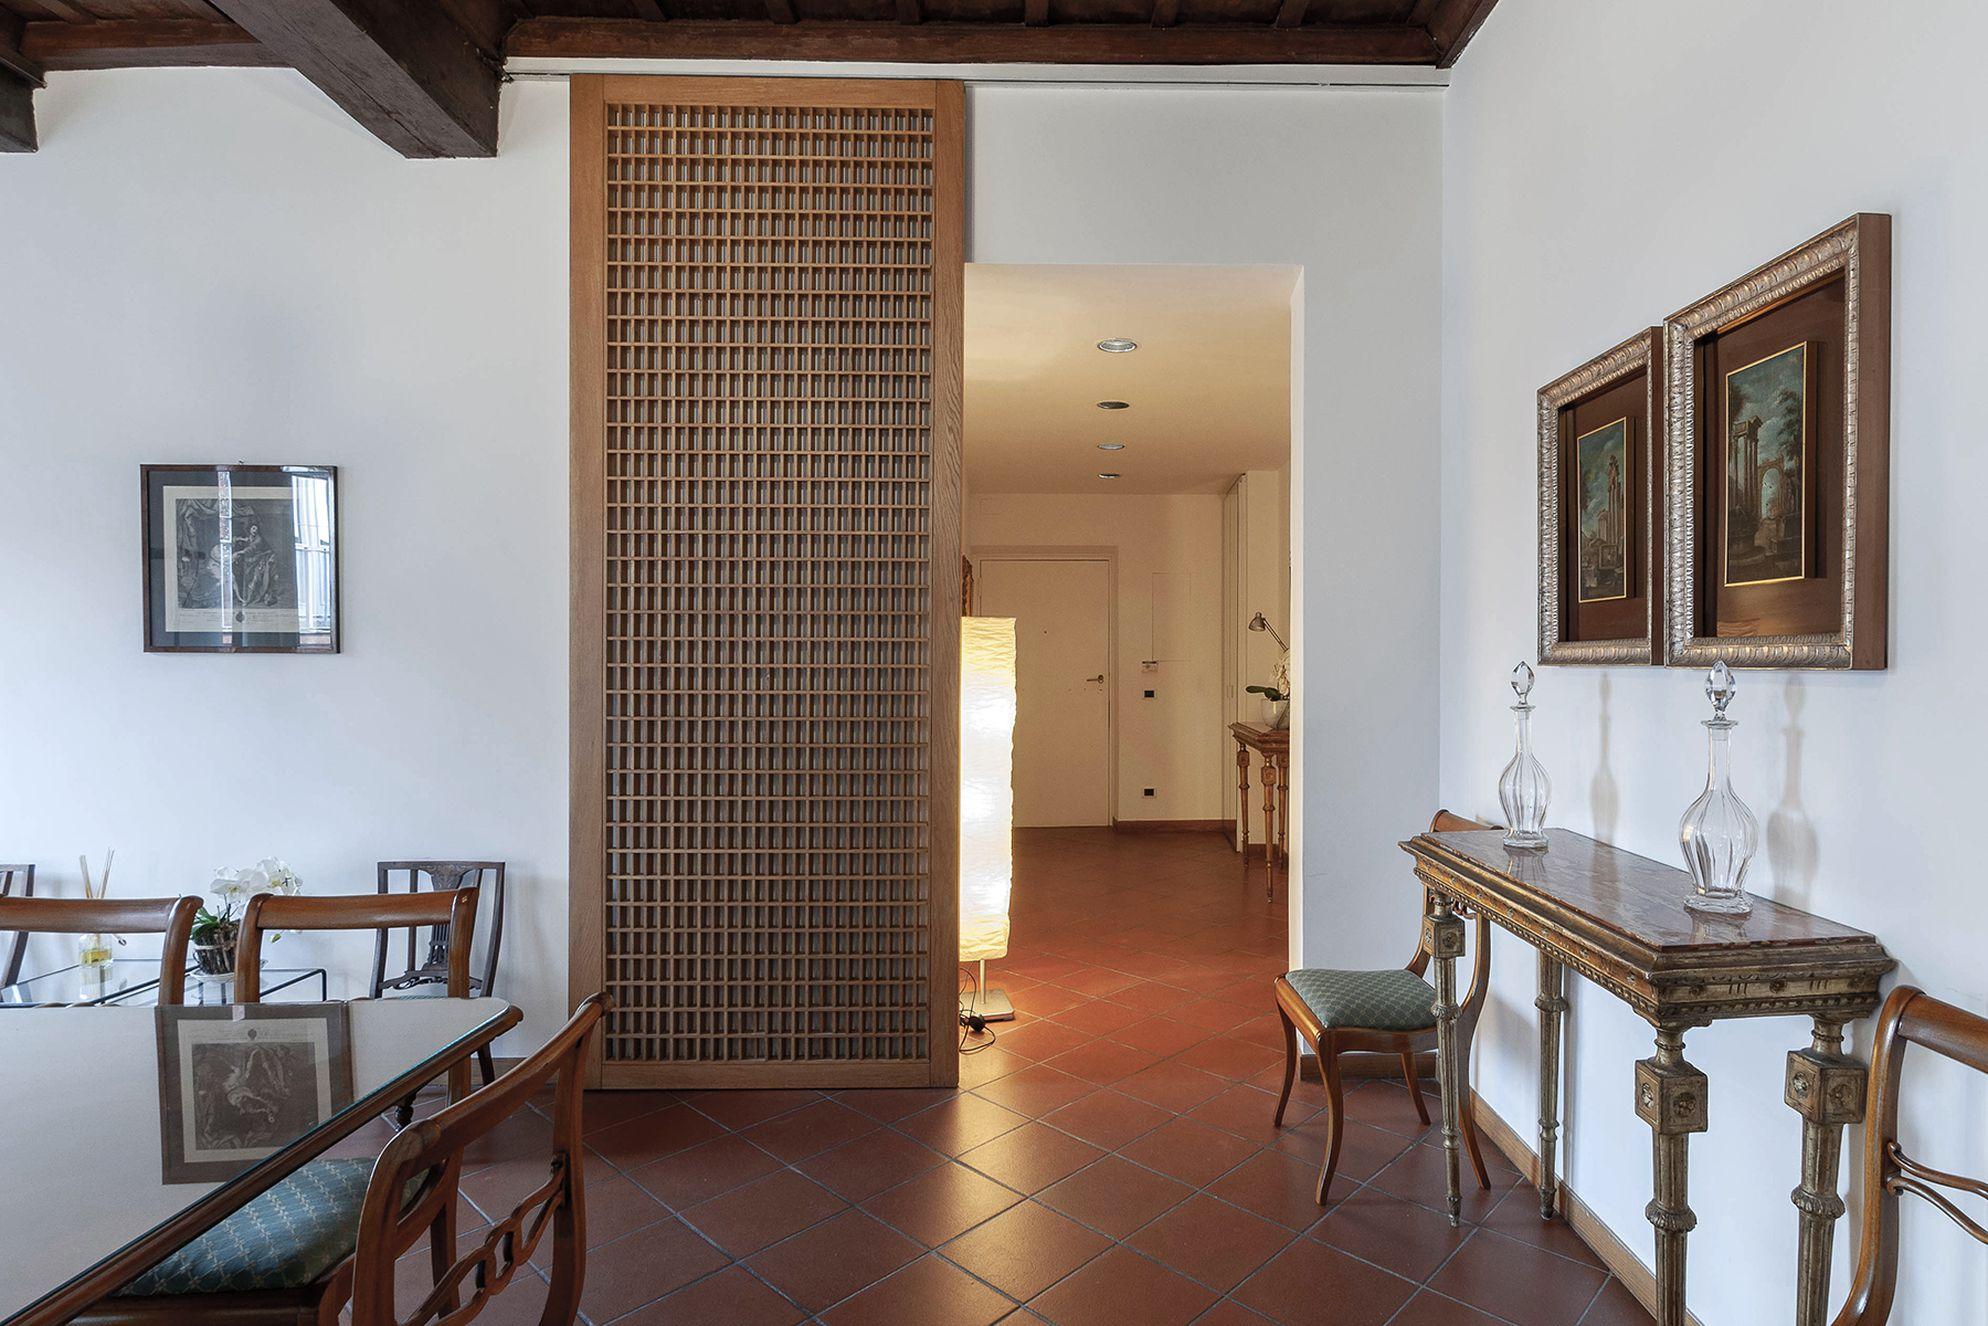 Casa Fontana di Trevi - Gallery